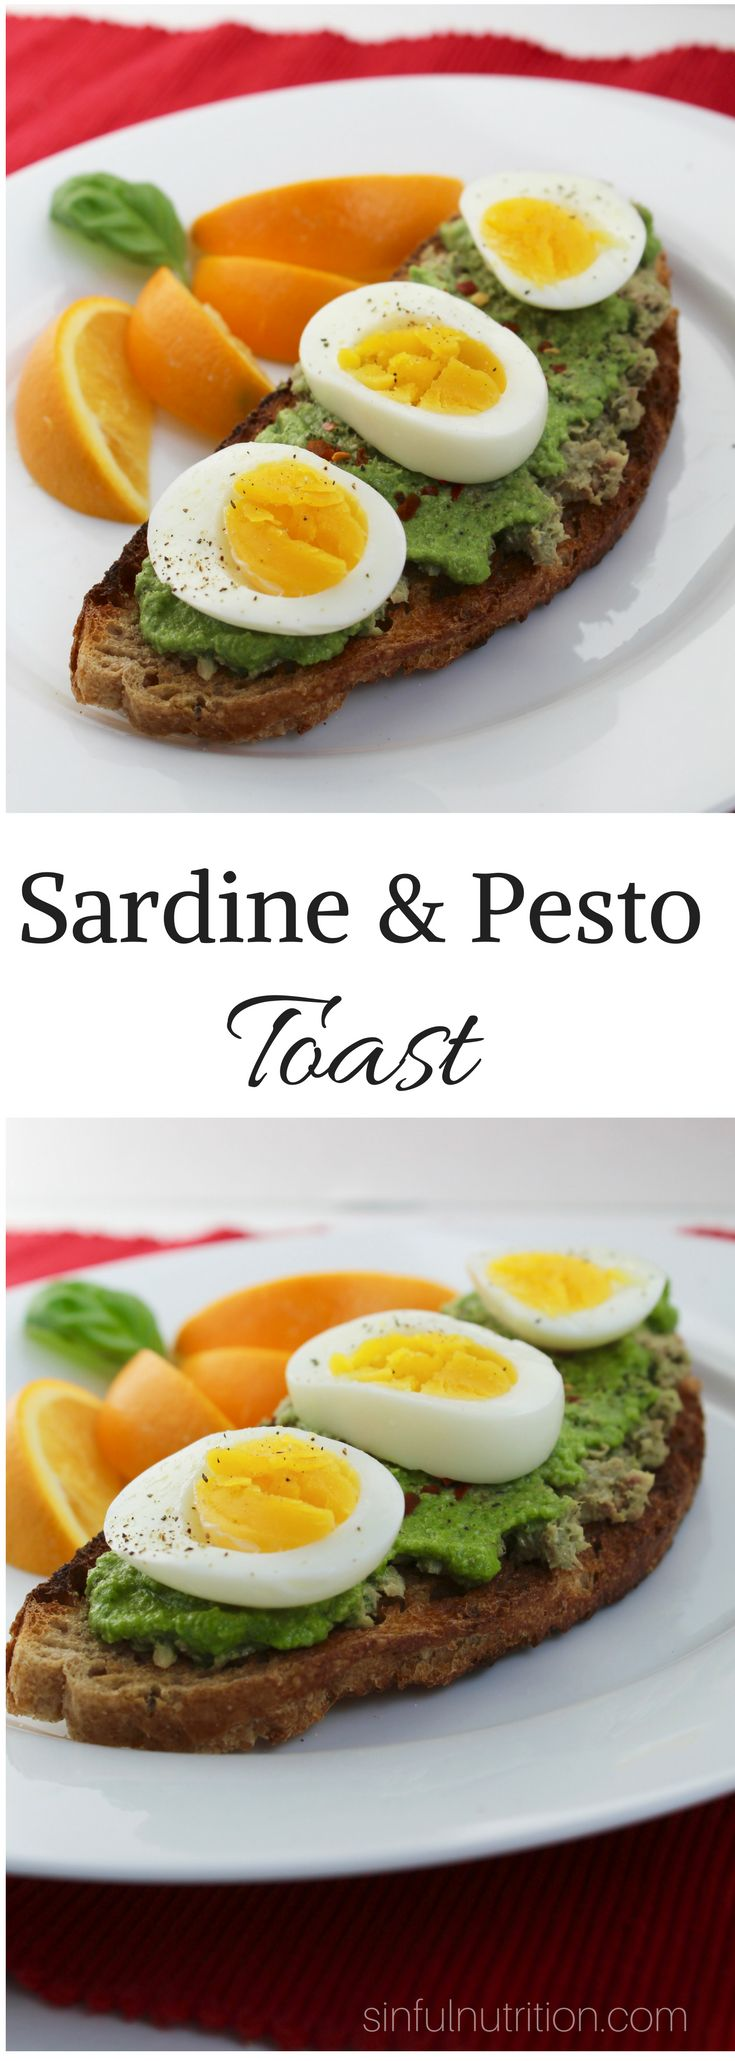 Best 25 sardine recipes ideas on pinterest recipe for for Sardine lunch ideas